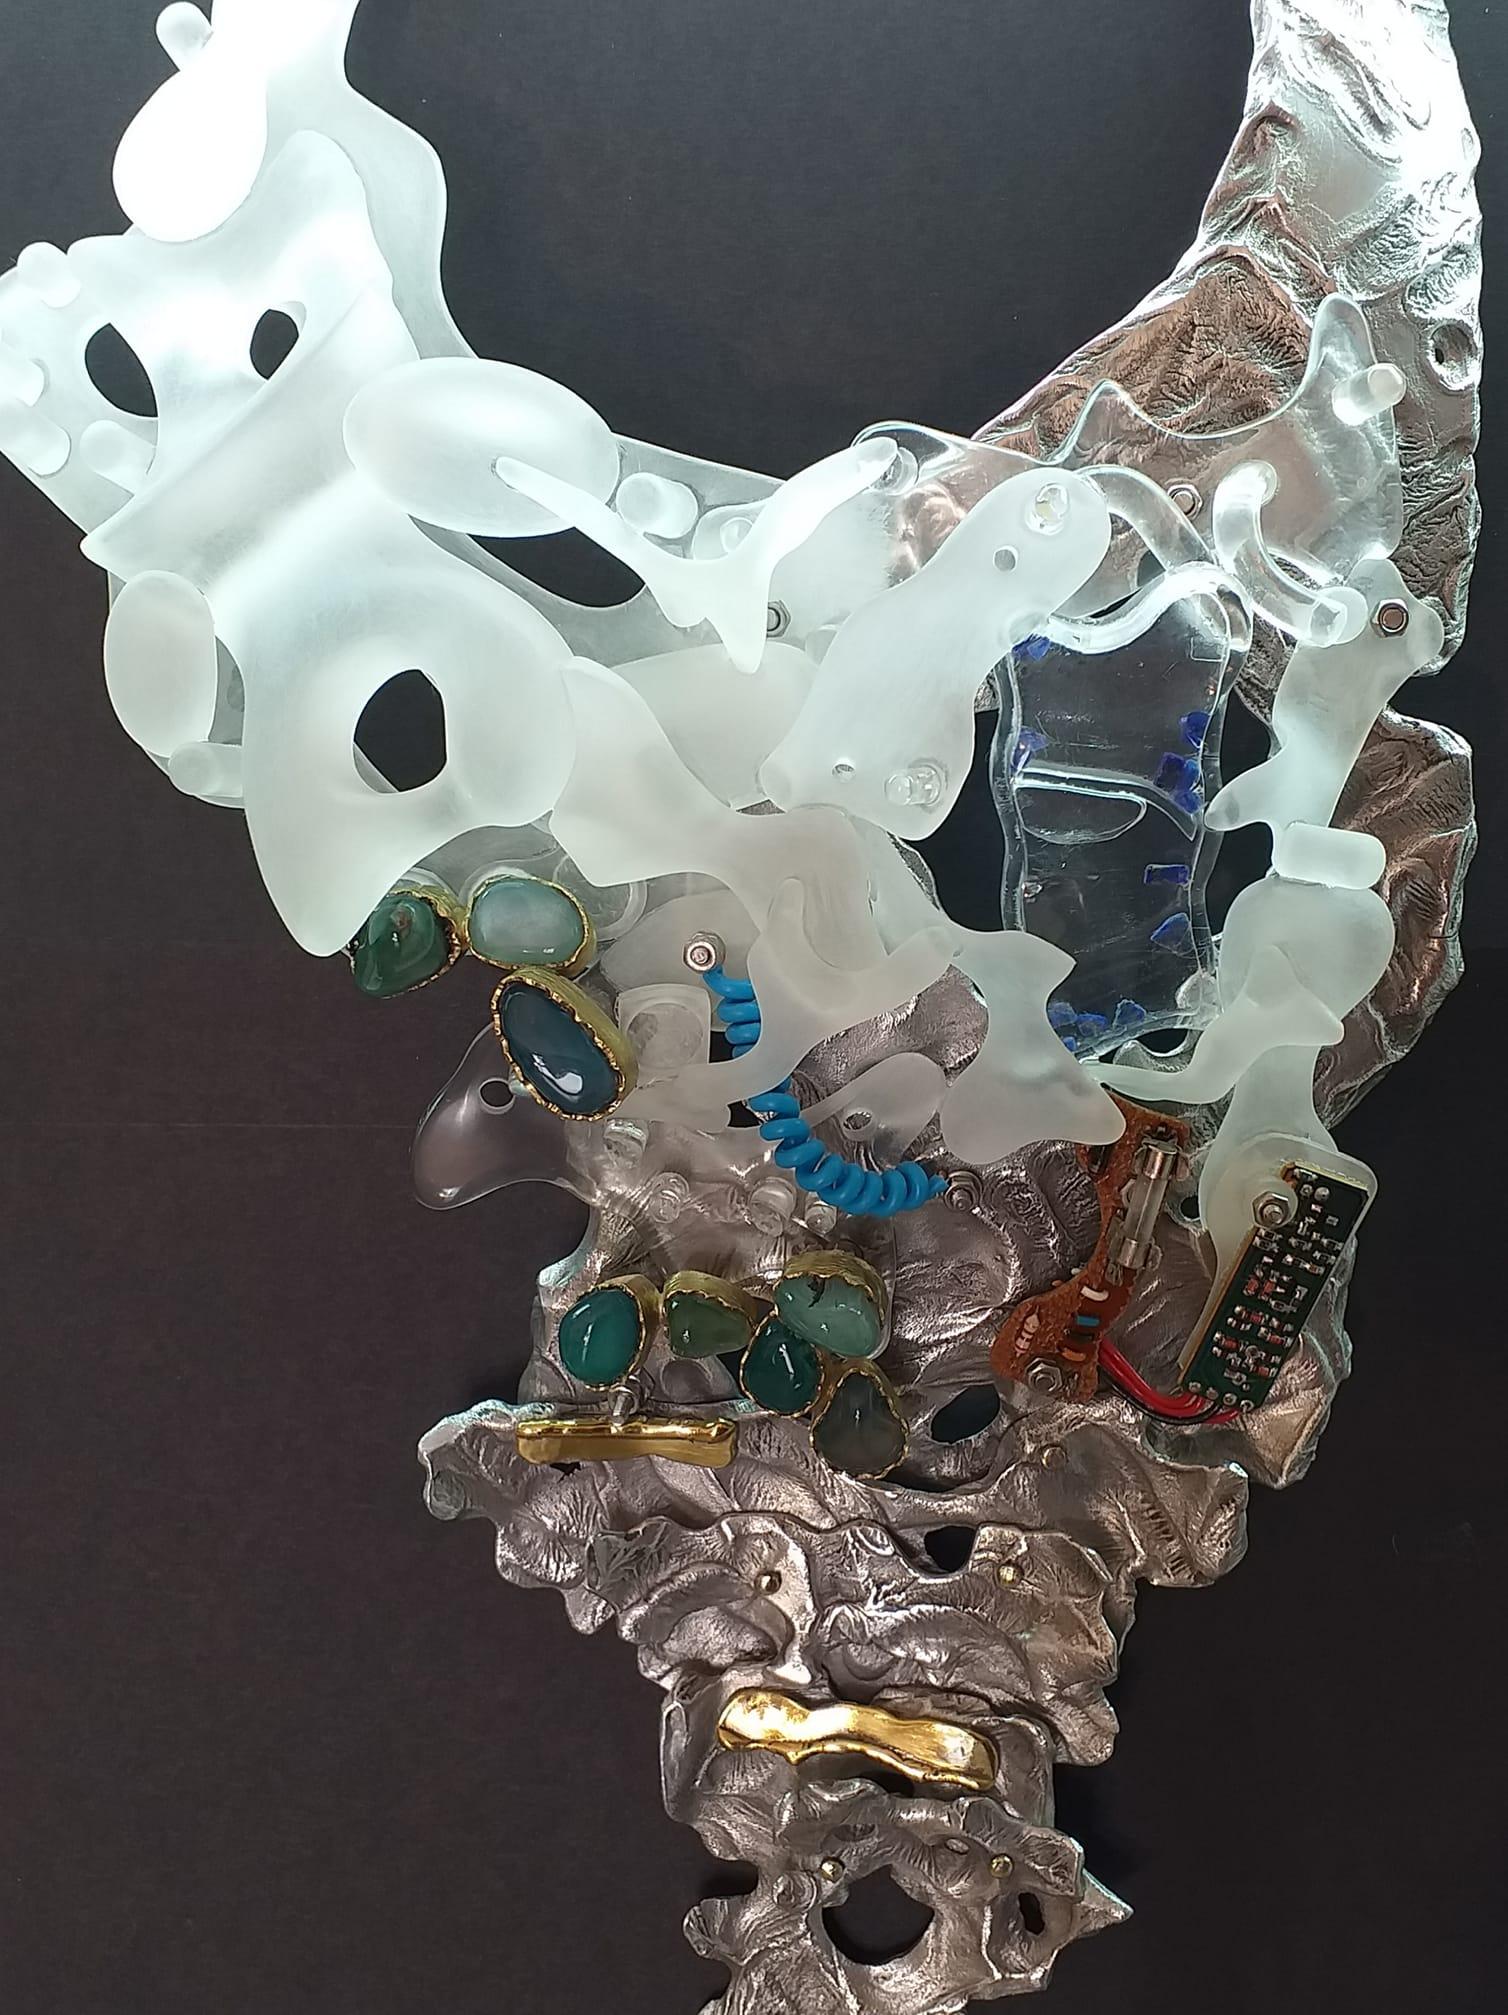 Alberto Gordillo, halssieraad, 2017-2020, plexiglas, aluminium, schroeven, messing, potlood, lapis lazuli, agaat